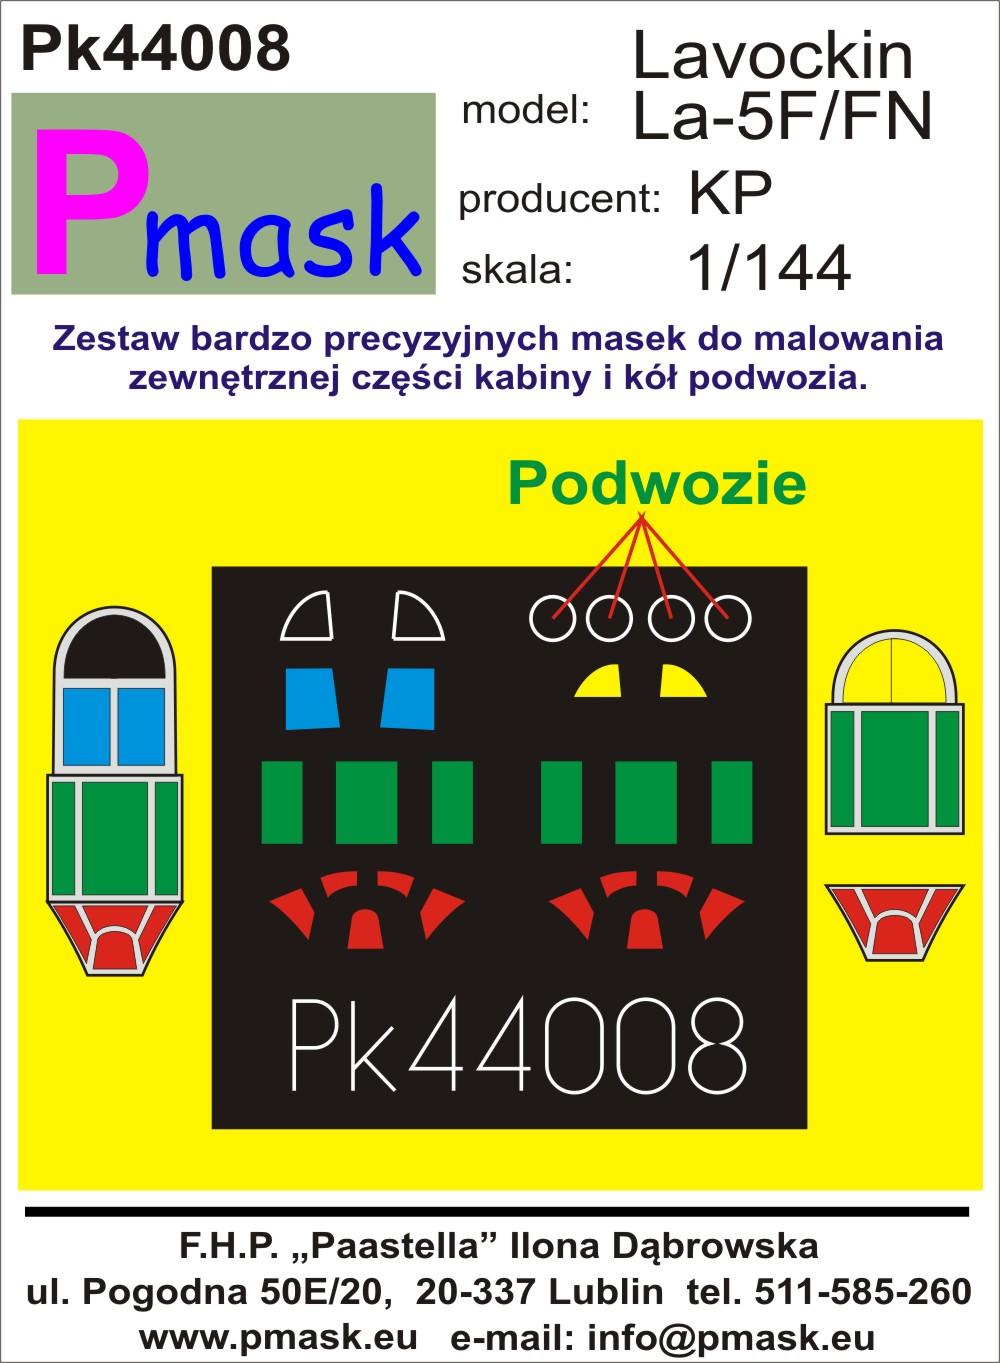 PK44008